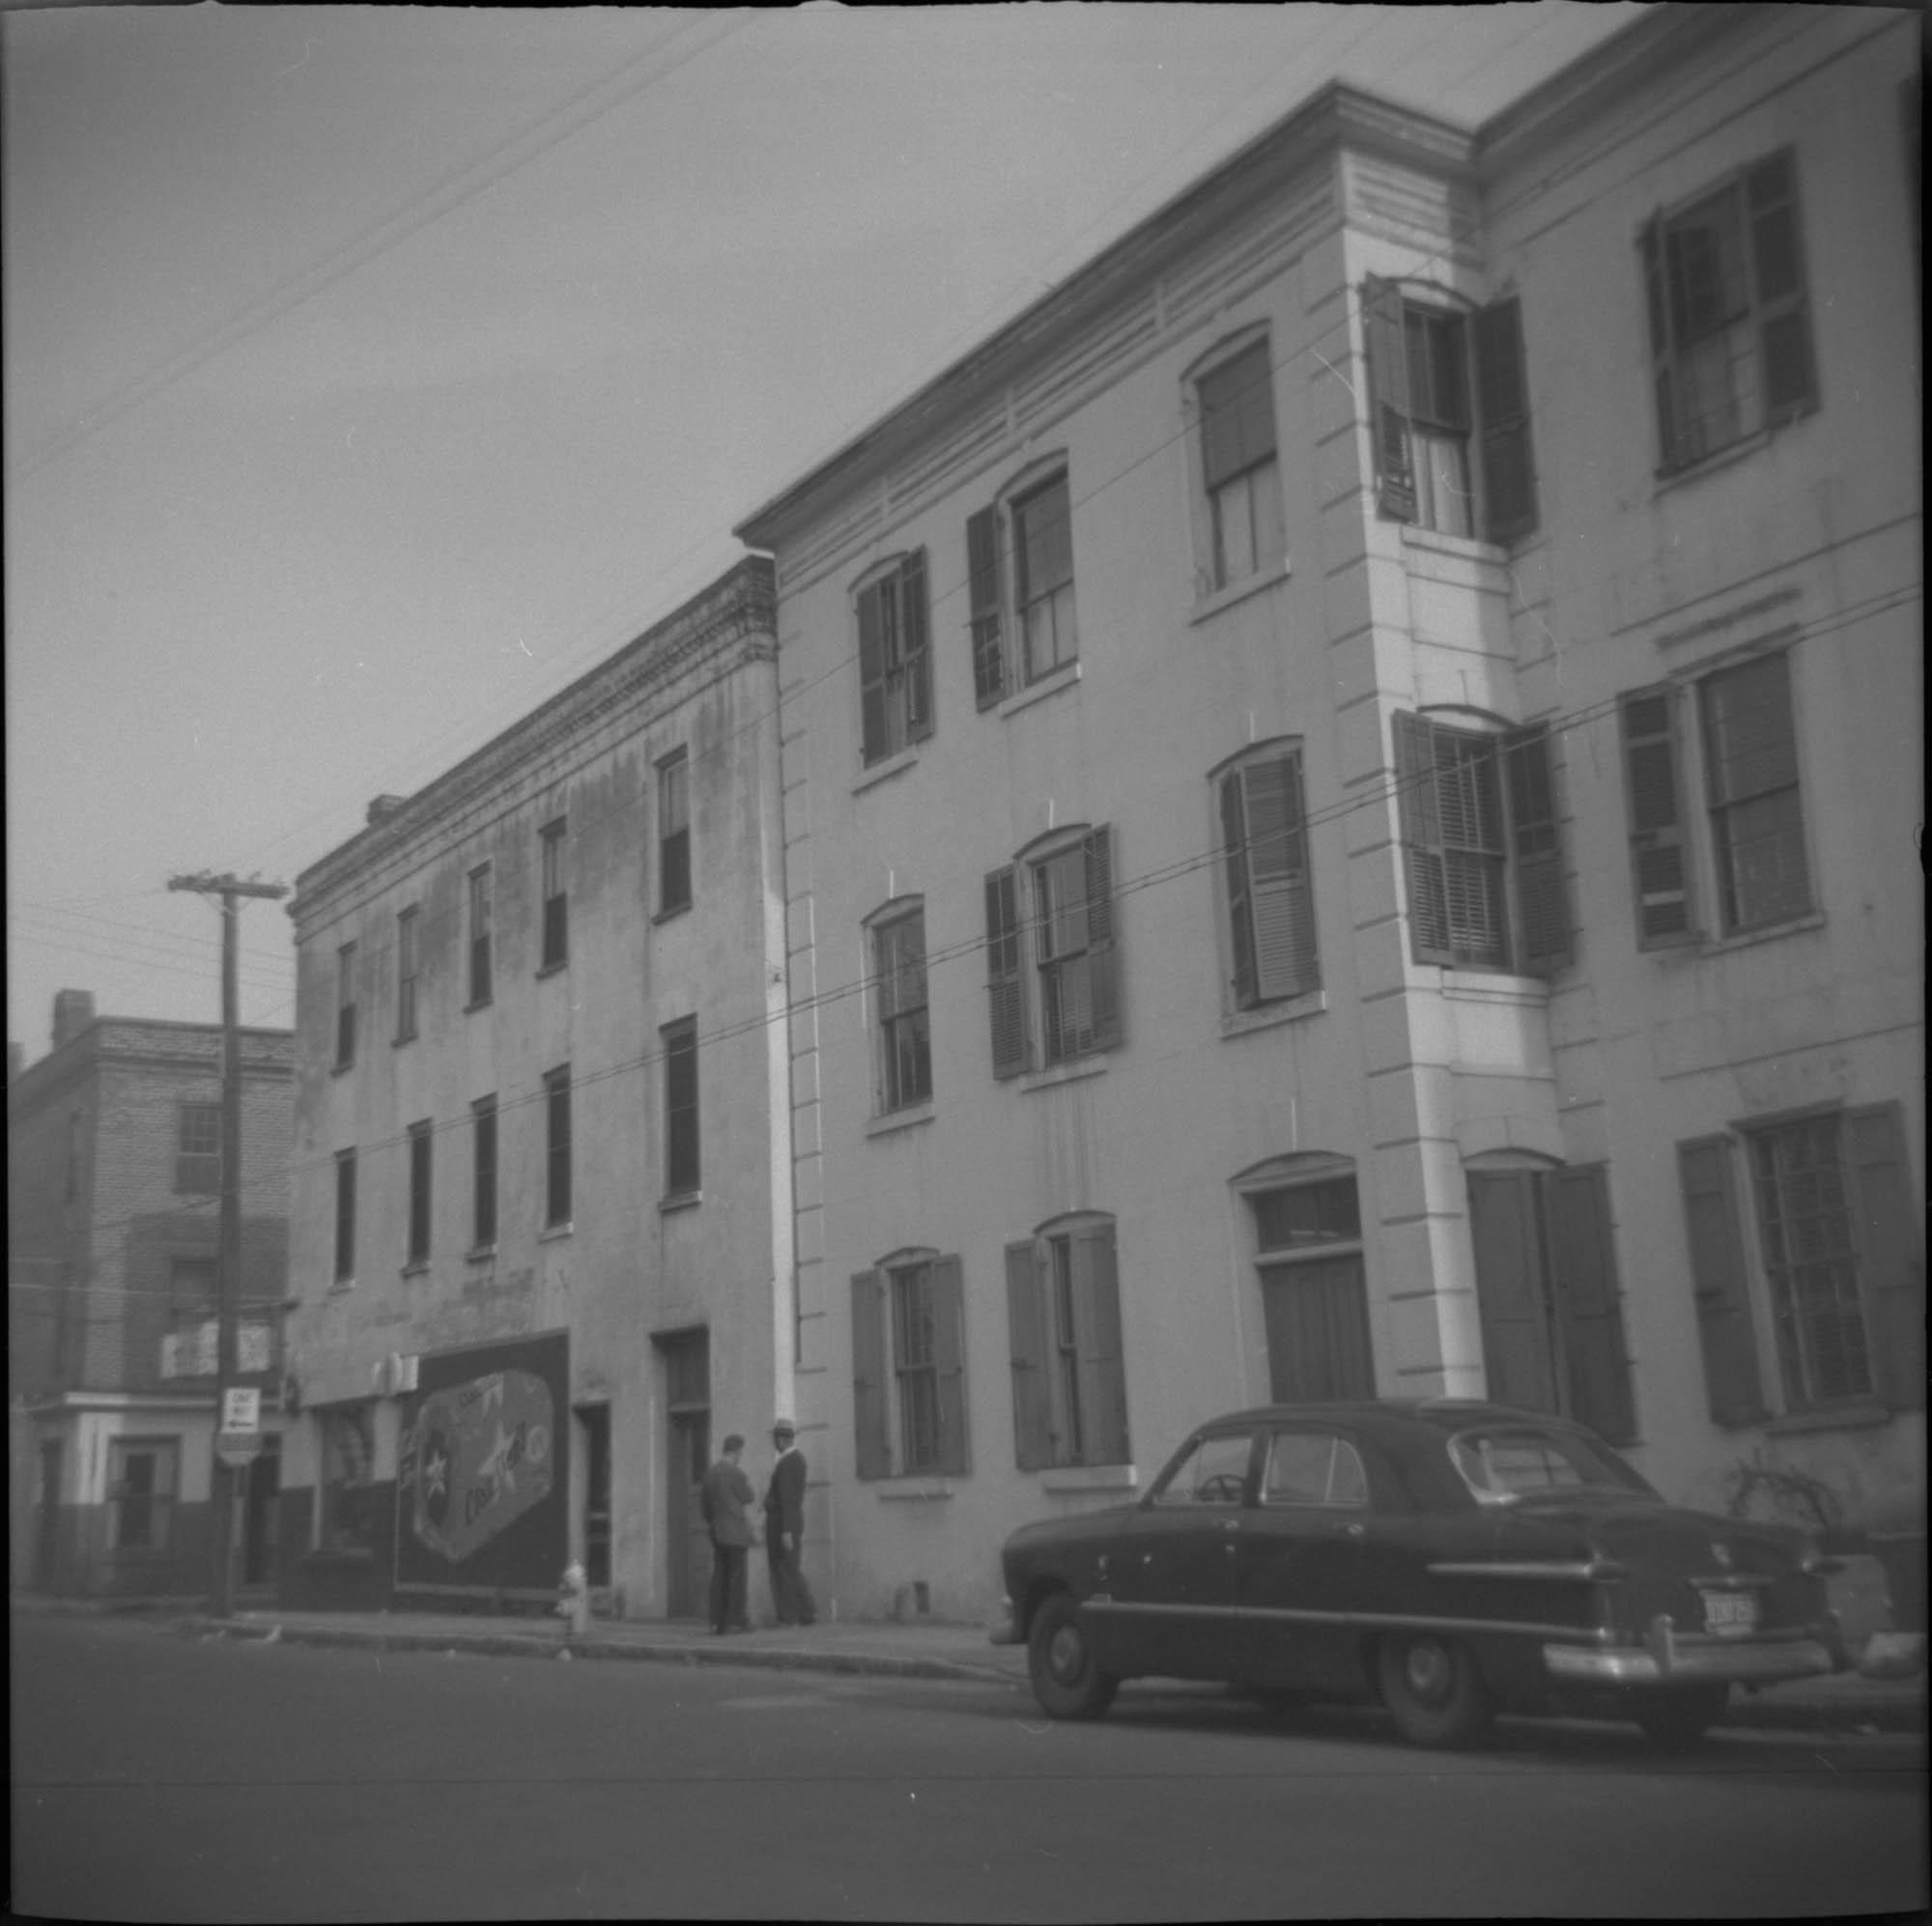 49 Society Street